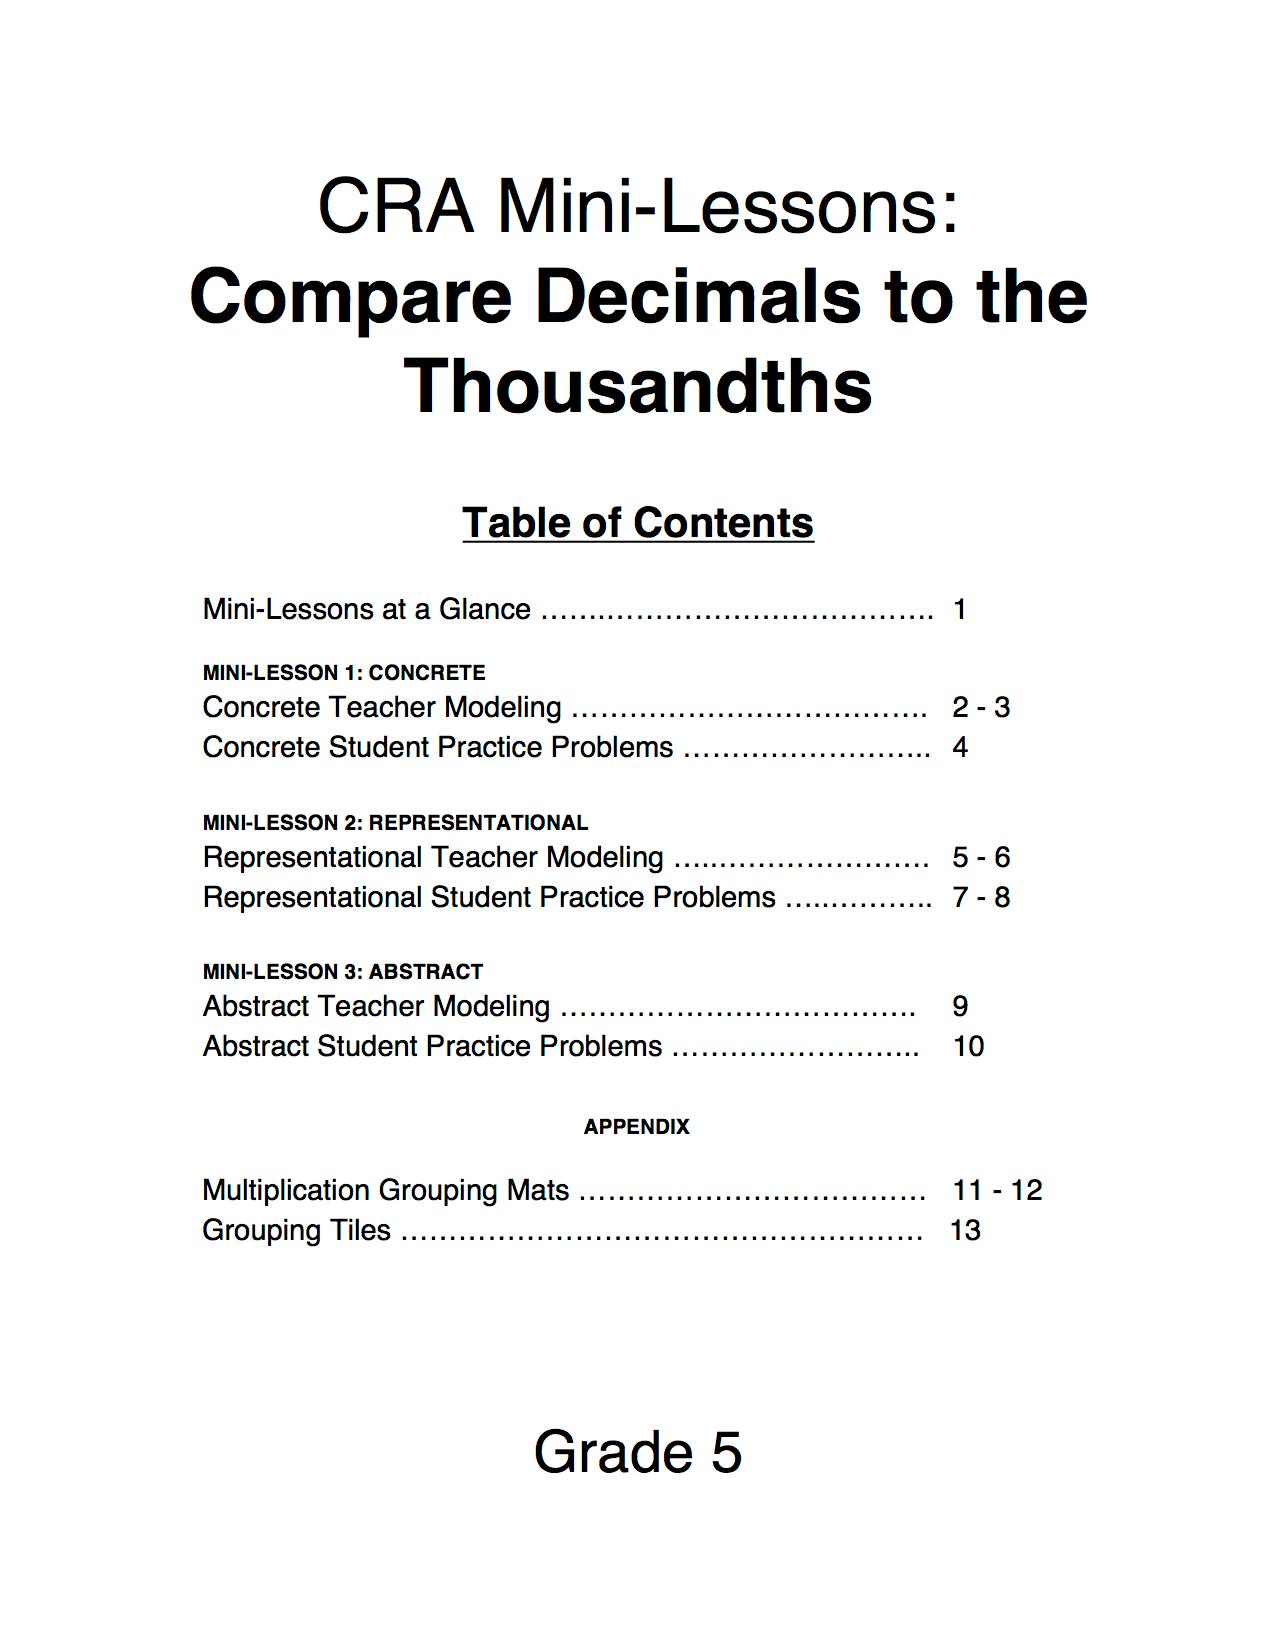 5 Nbt 3 Decimals To The Thousandths